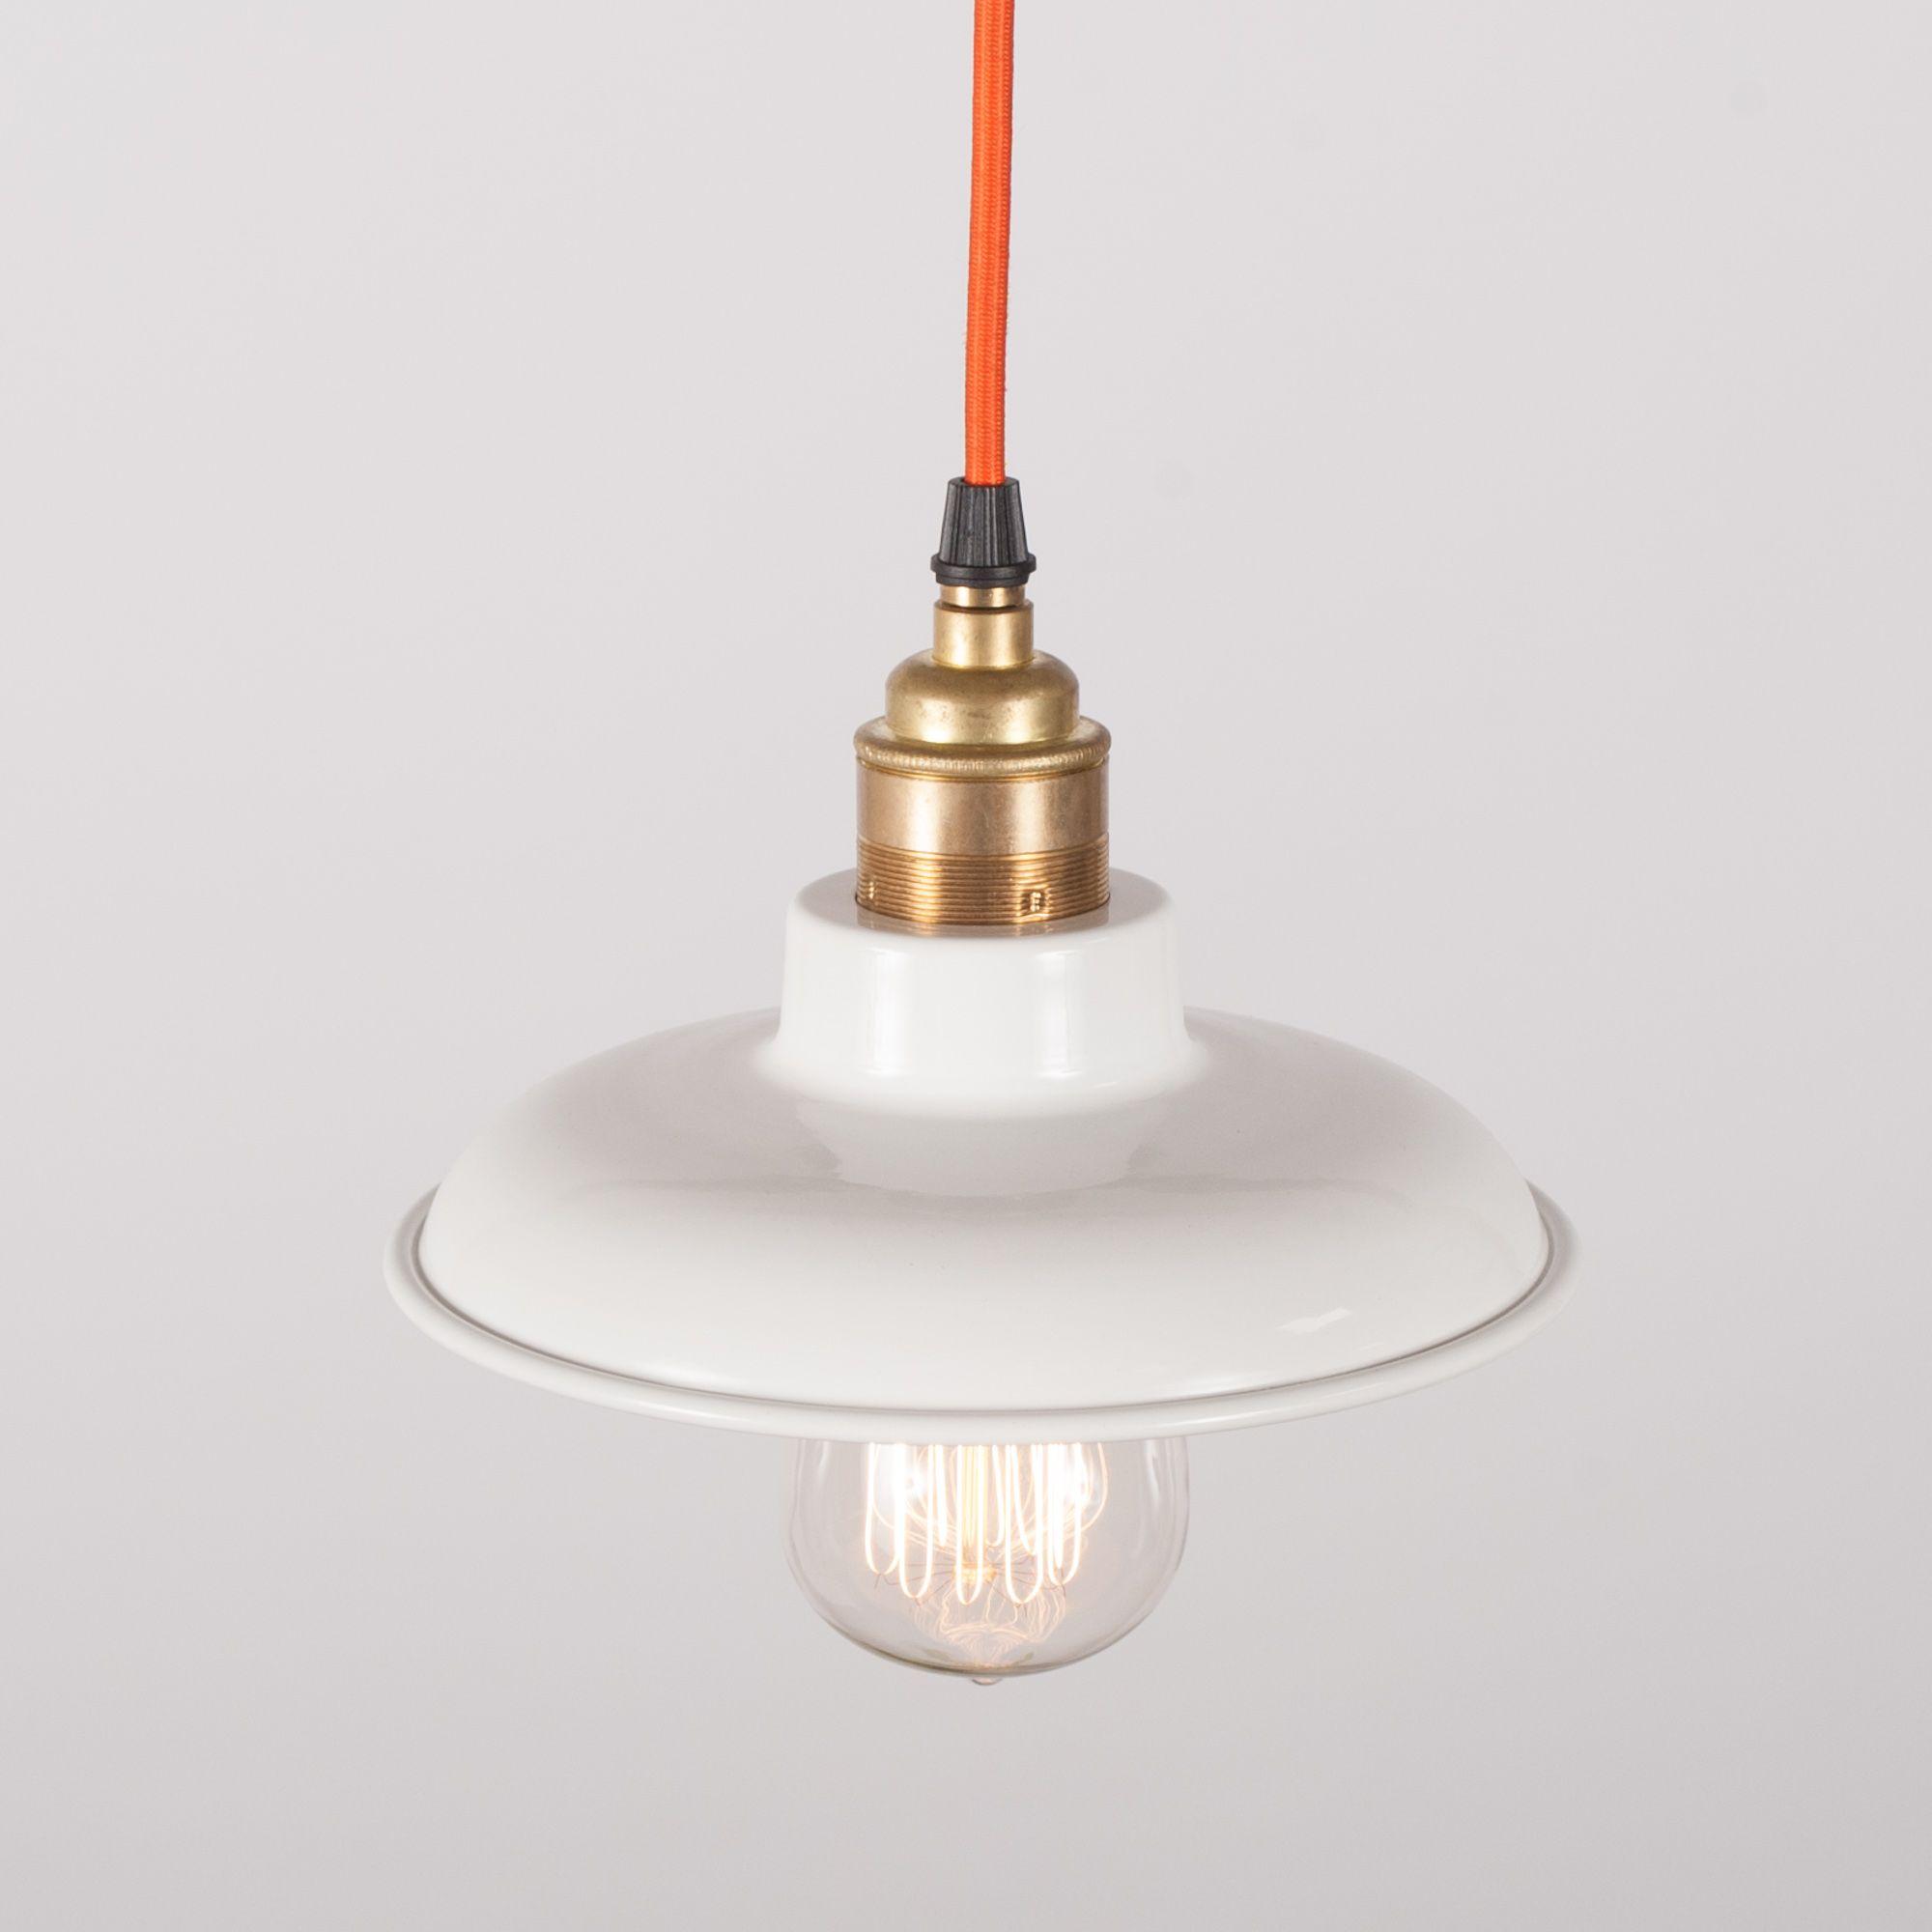 f824647ff66c Small Flat White Enamel Lamp Shade |